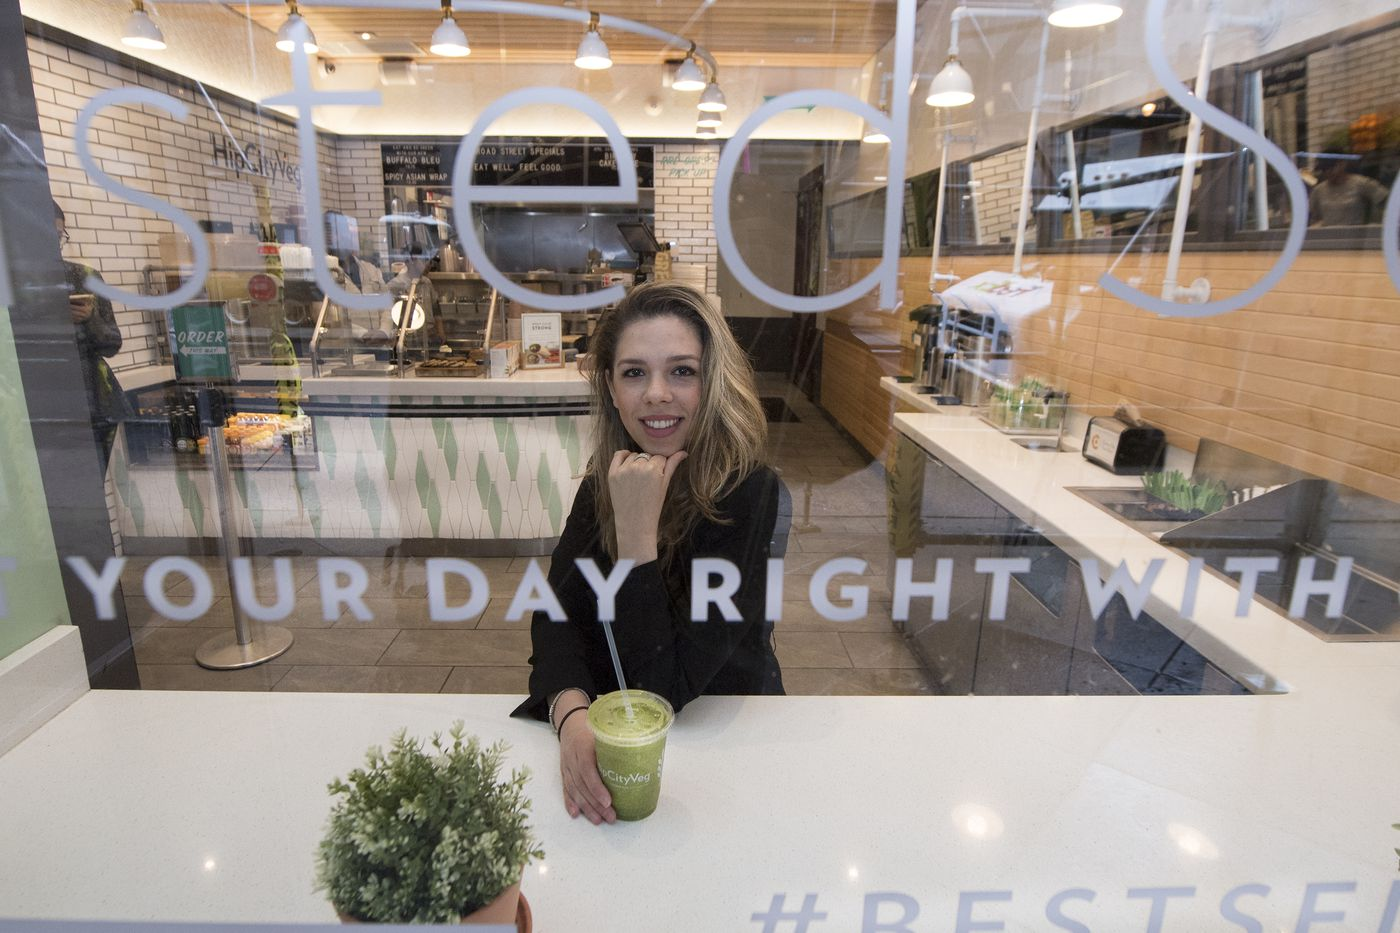 HipCityVeg to bring vegan food to the Main Line